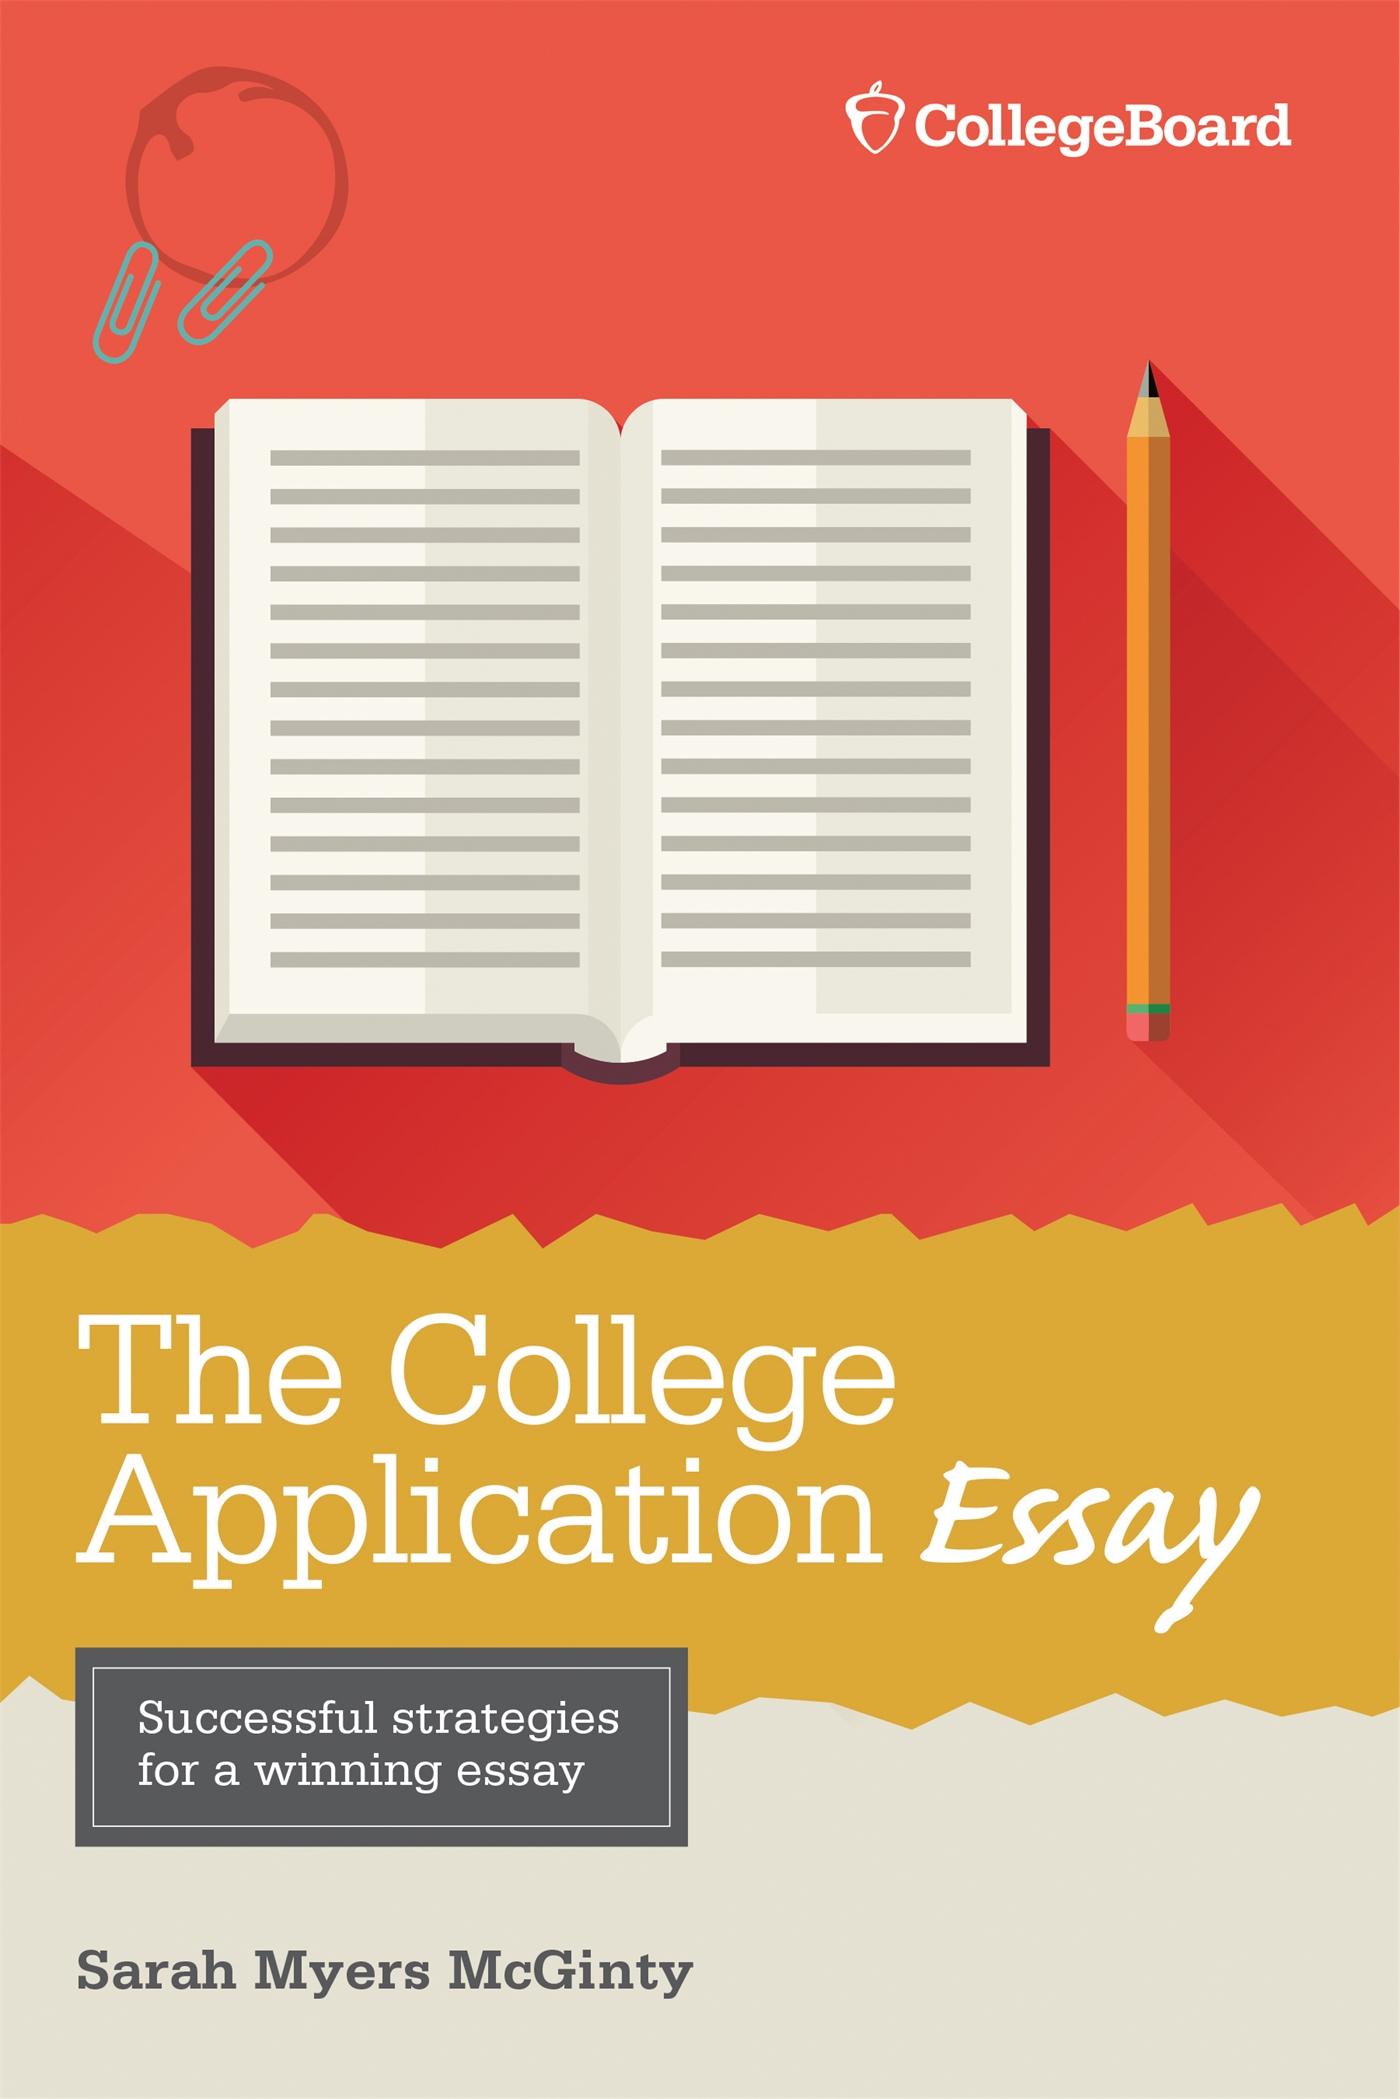 collegeboard essay